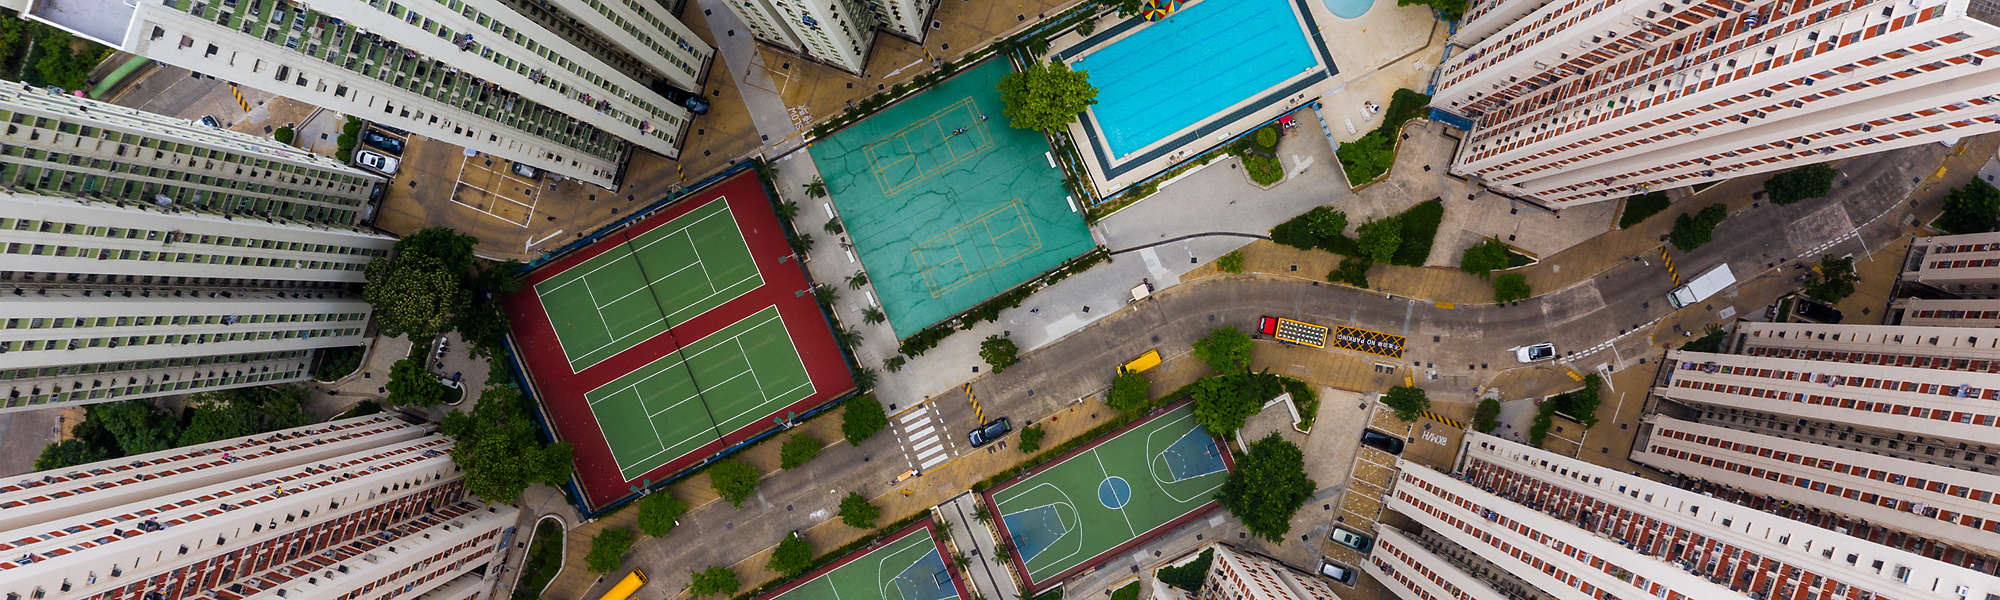 Aerial residential building Hong Kong